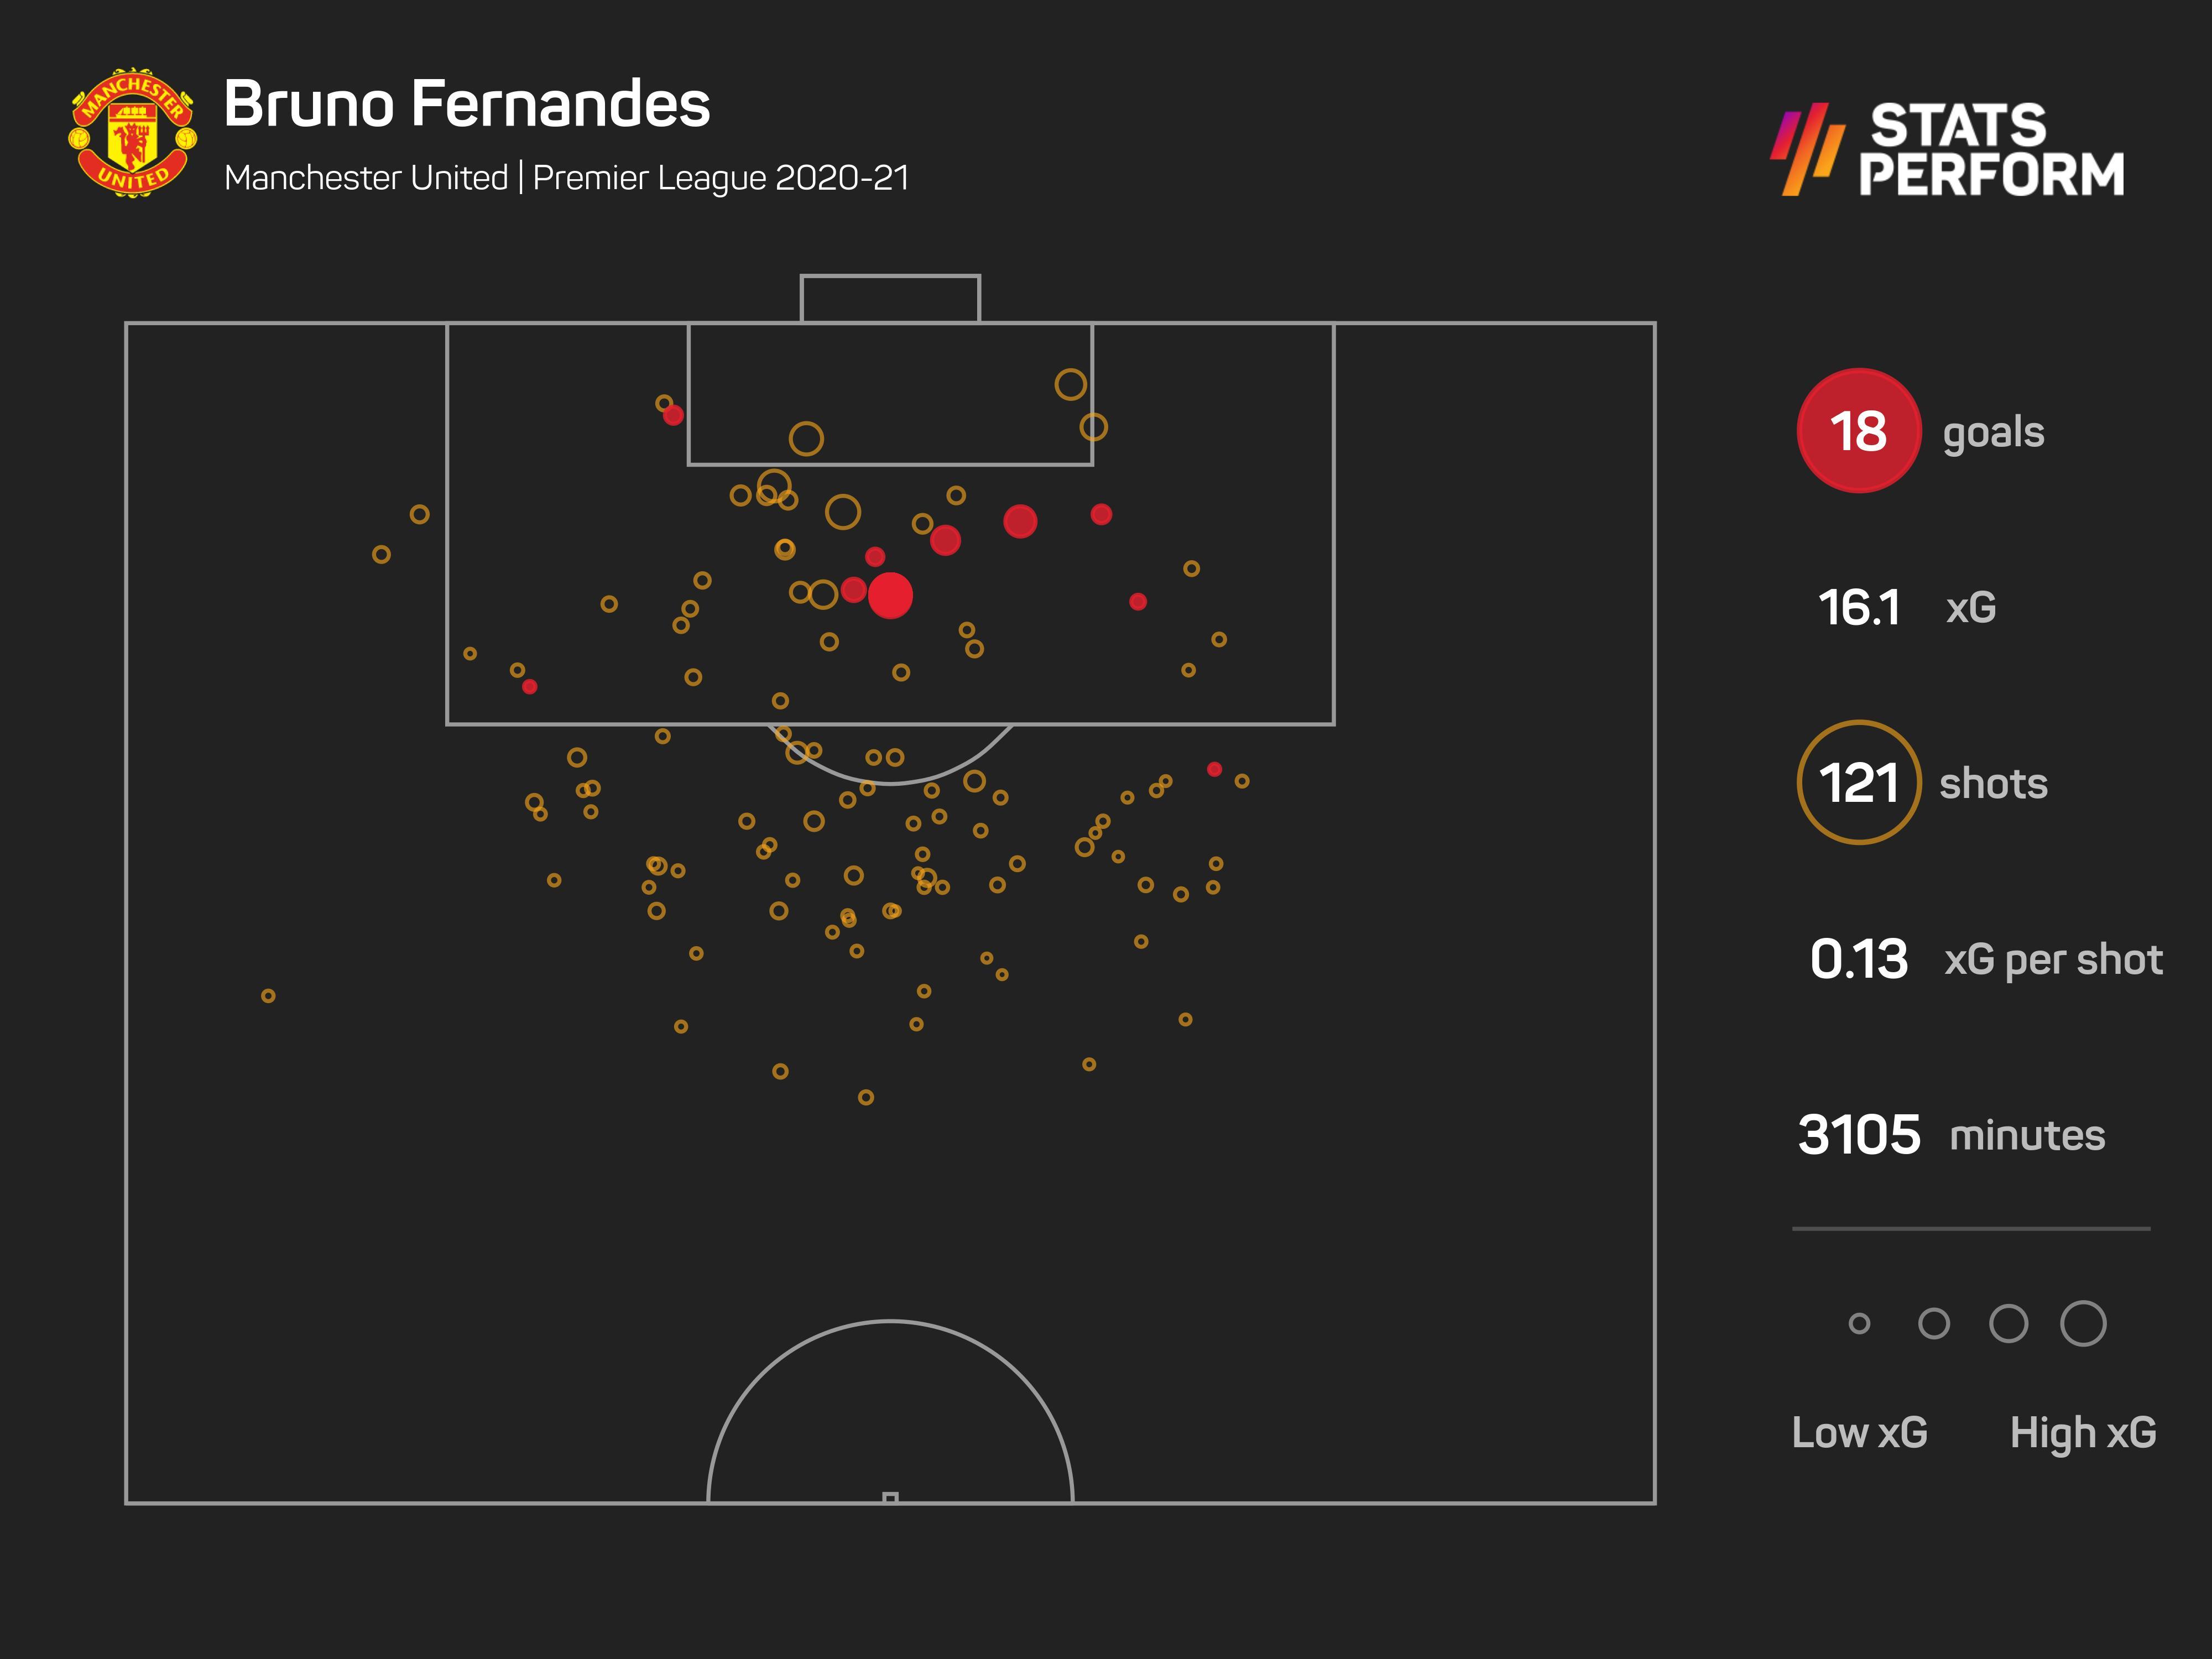 Bruno Fernandes in the Premier League 2020-21